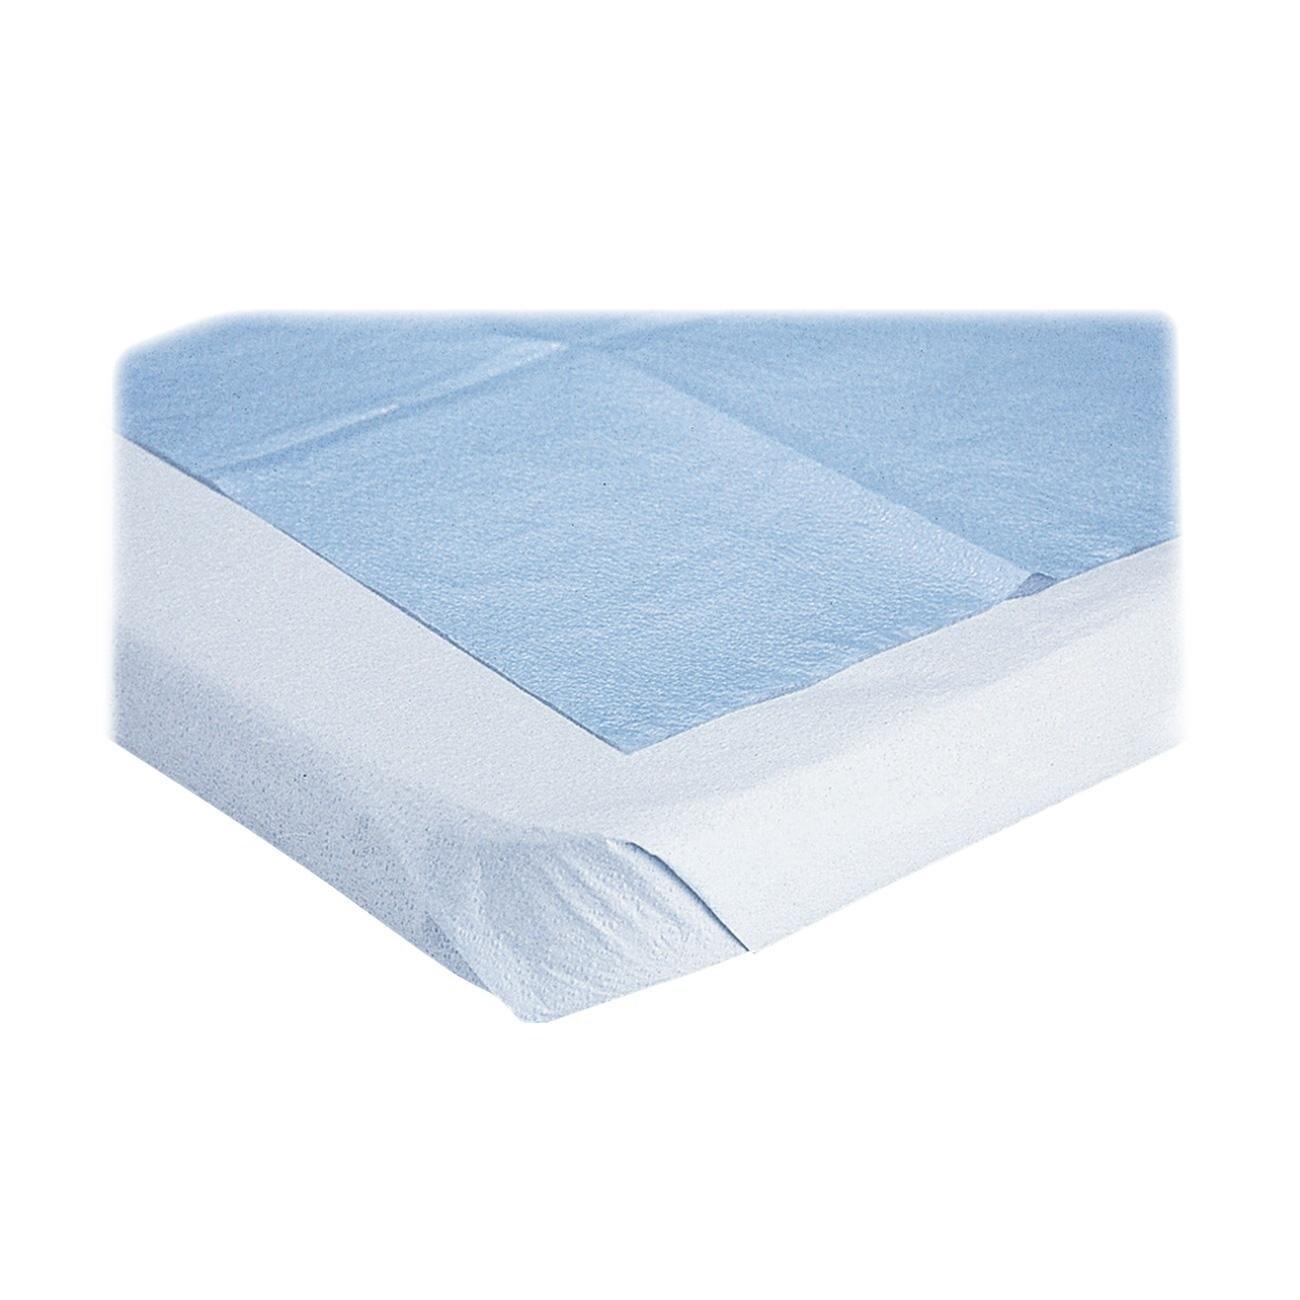 medline Disposable 2-Ply Drape Sheets (Box of 100) (MIINO...